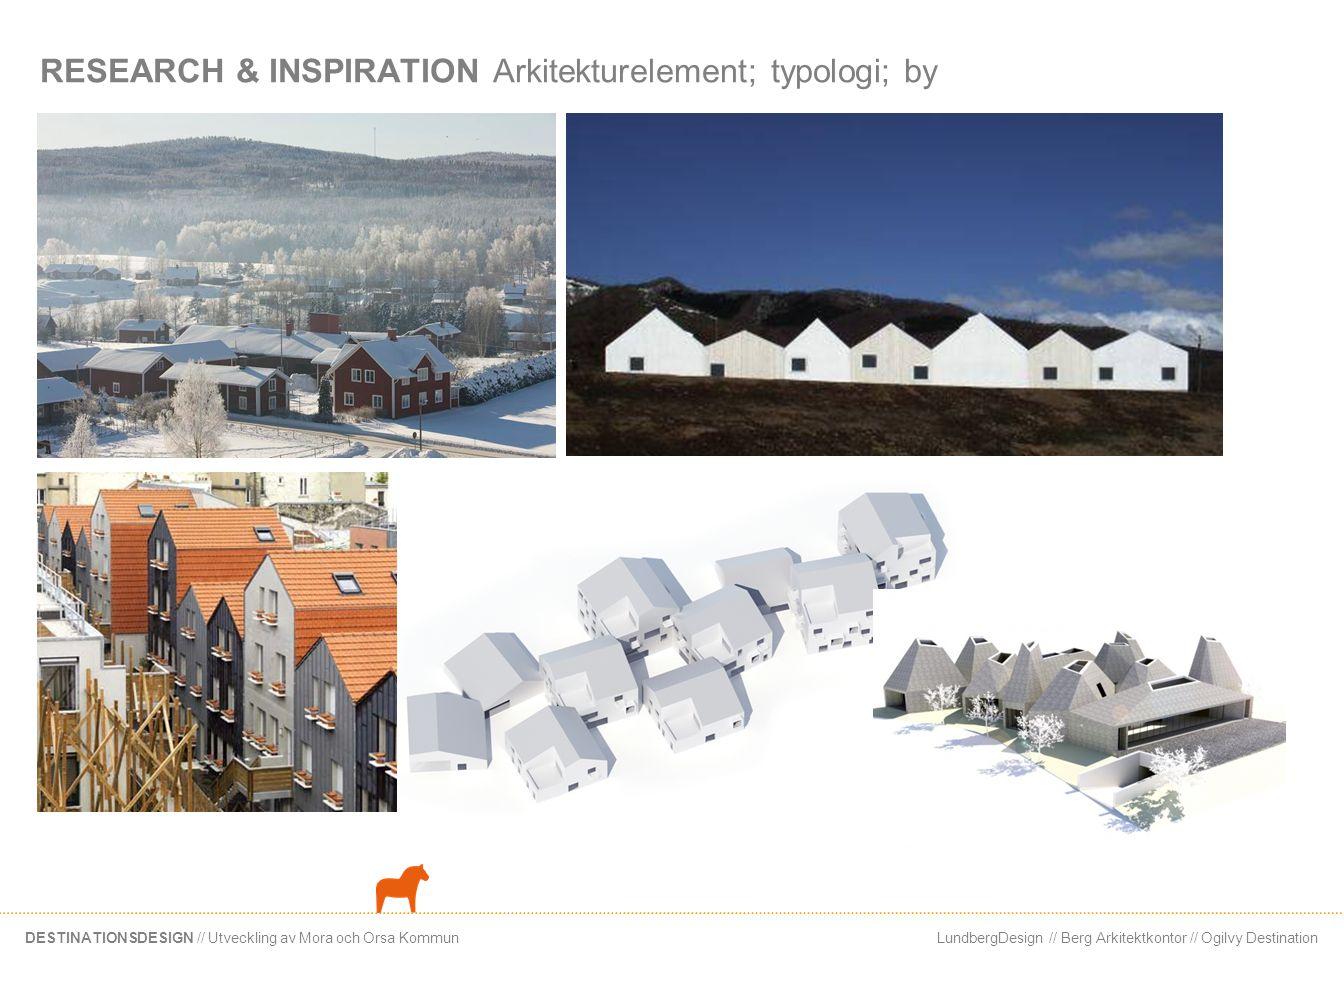 LundbergDesign // Berg Arkitektkontor // Ogilvy DestinationDESTINATIONSDESIGN // Utveckling av Mora och Orsa Kommun RESEARCH & INSPIRATION Arkitekturelement; typologi stuga